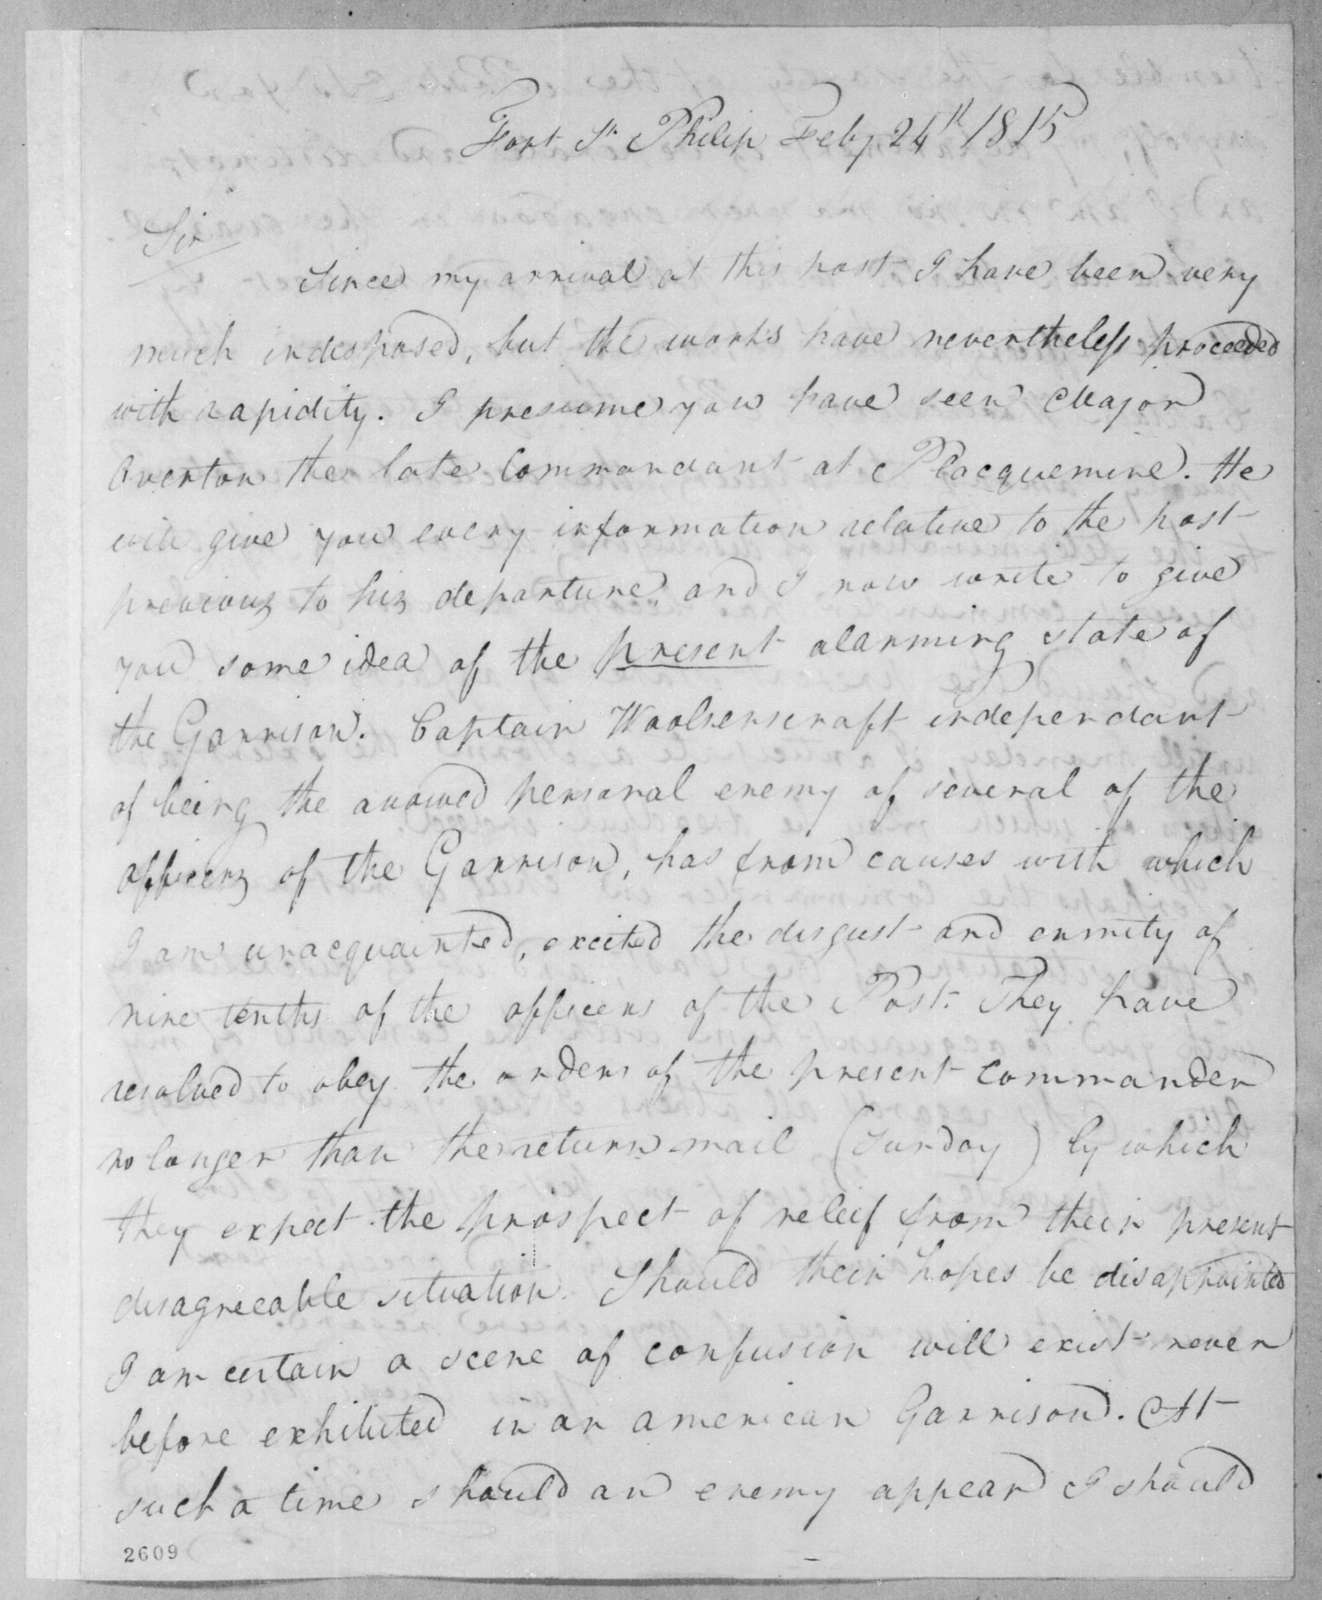 Charles K. Blanchard to David C. Ker, February 24, 1815